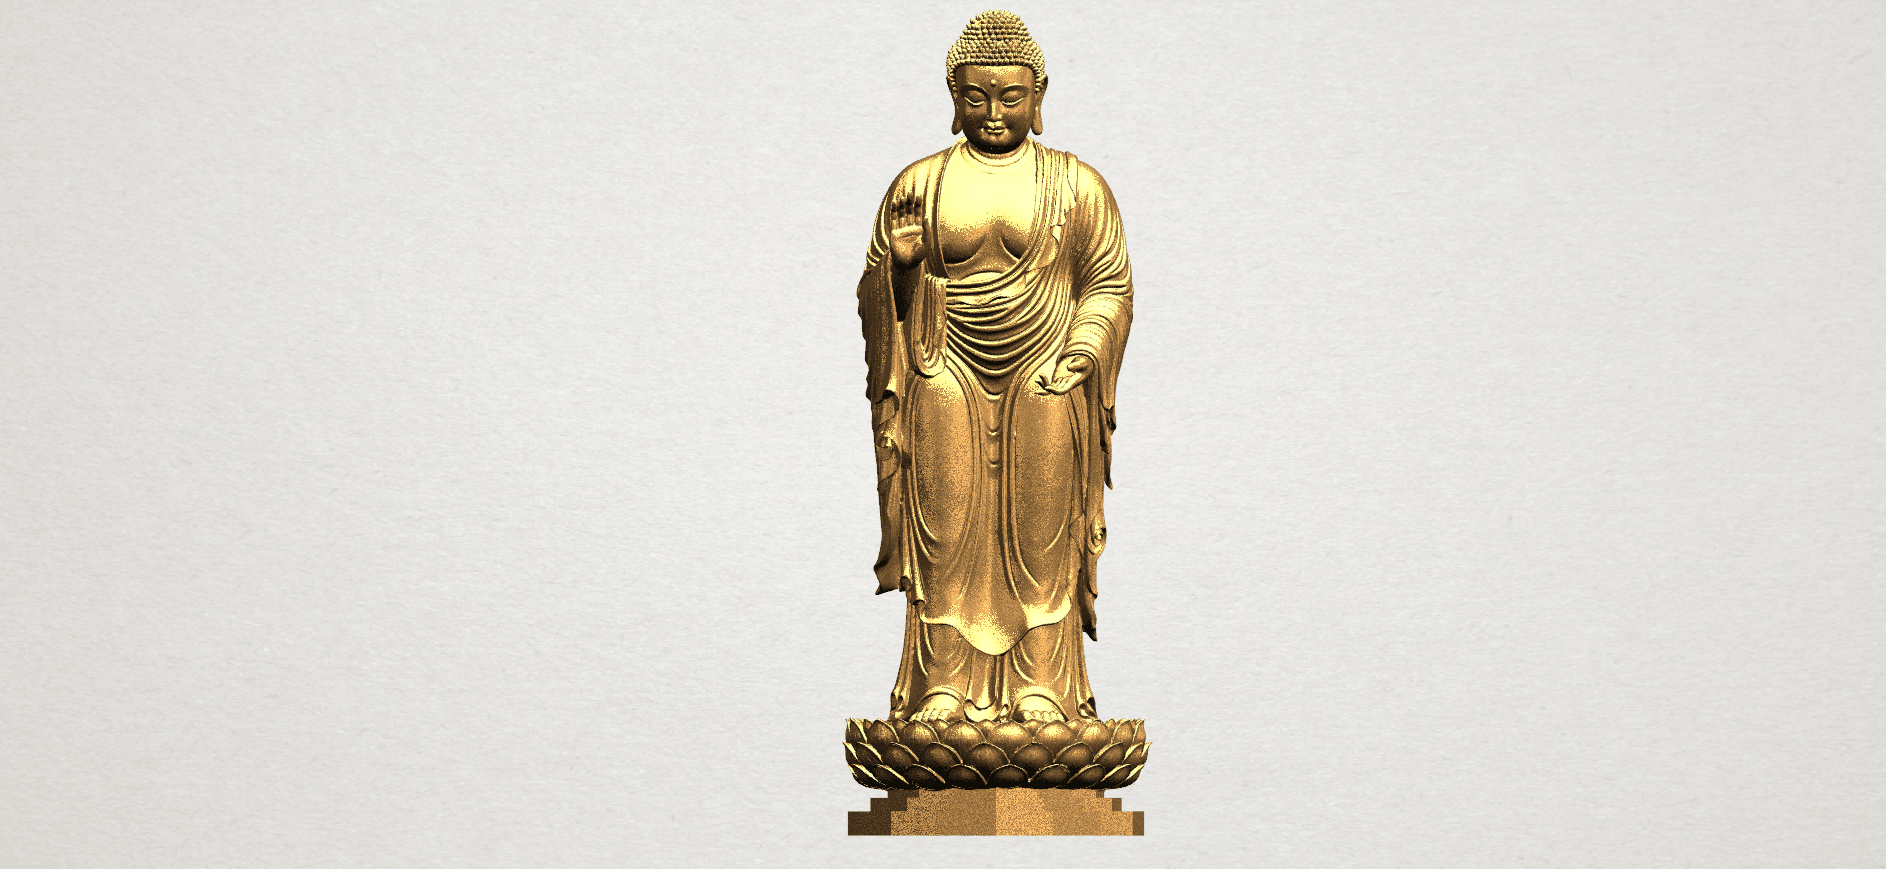 Gautama Buddha Standing (ii) A01.png Download free STL file Gautama Buddha Standing 02 • 3D printer design, GeorgesNikkei